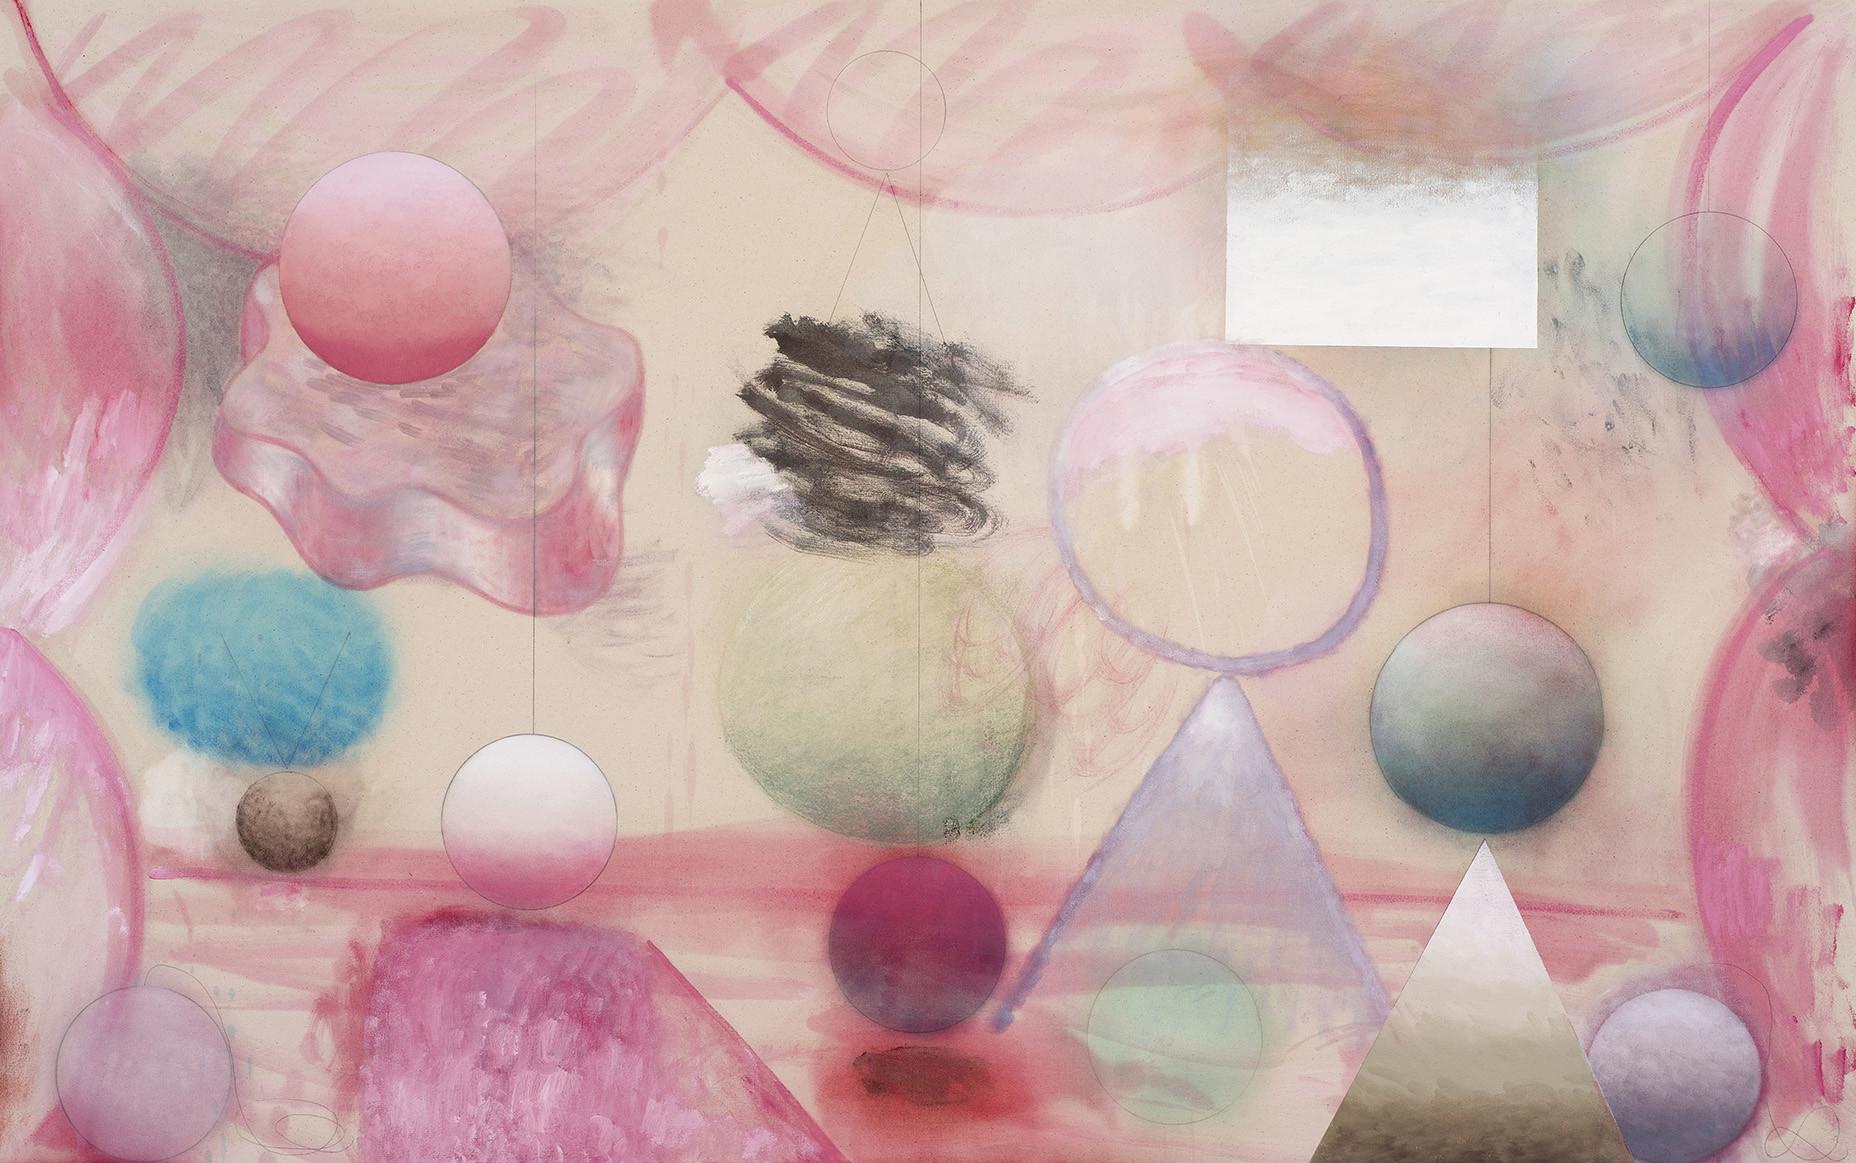 <span class=&#34;link fancybox-details-link&#34;><a href=&#34;/exhibitions/16/works/artworks824/&#34;>View Detail Page</a></span><div class=&#34;artist&#34;><strong>William Stein</strong></div><div class=&#34;title&#34;><em>8000 Metres Down</em>, 2018</div><div class=&#34;medium&#34;>oil, pastel and pencil on canvas</div><div class=&#34;dimensions&#34;>100 x 160cm</div>